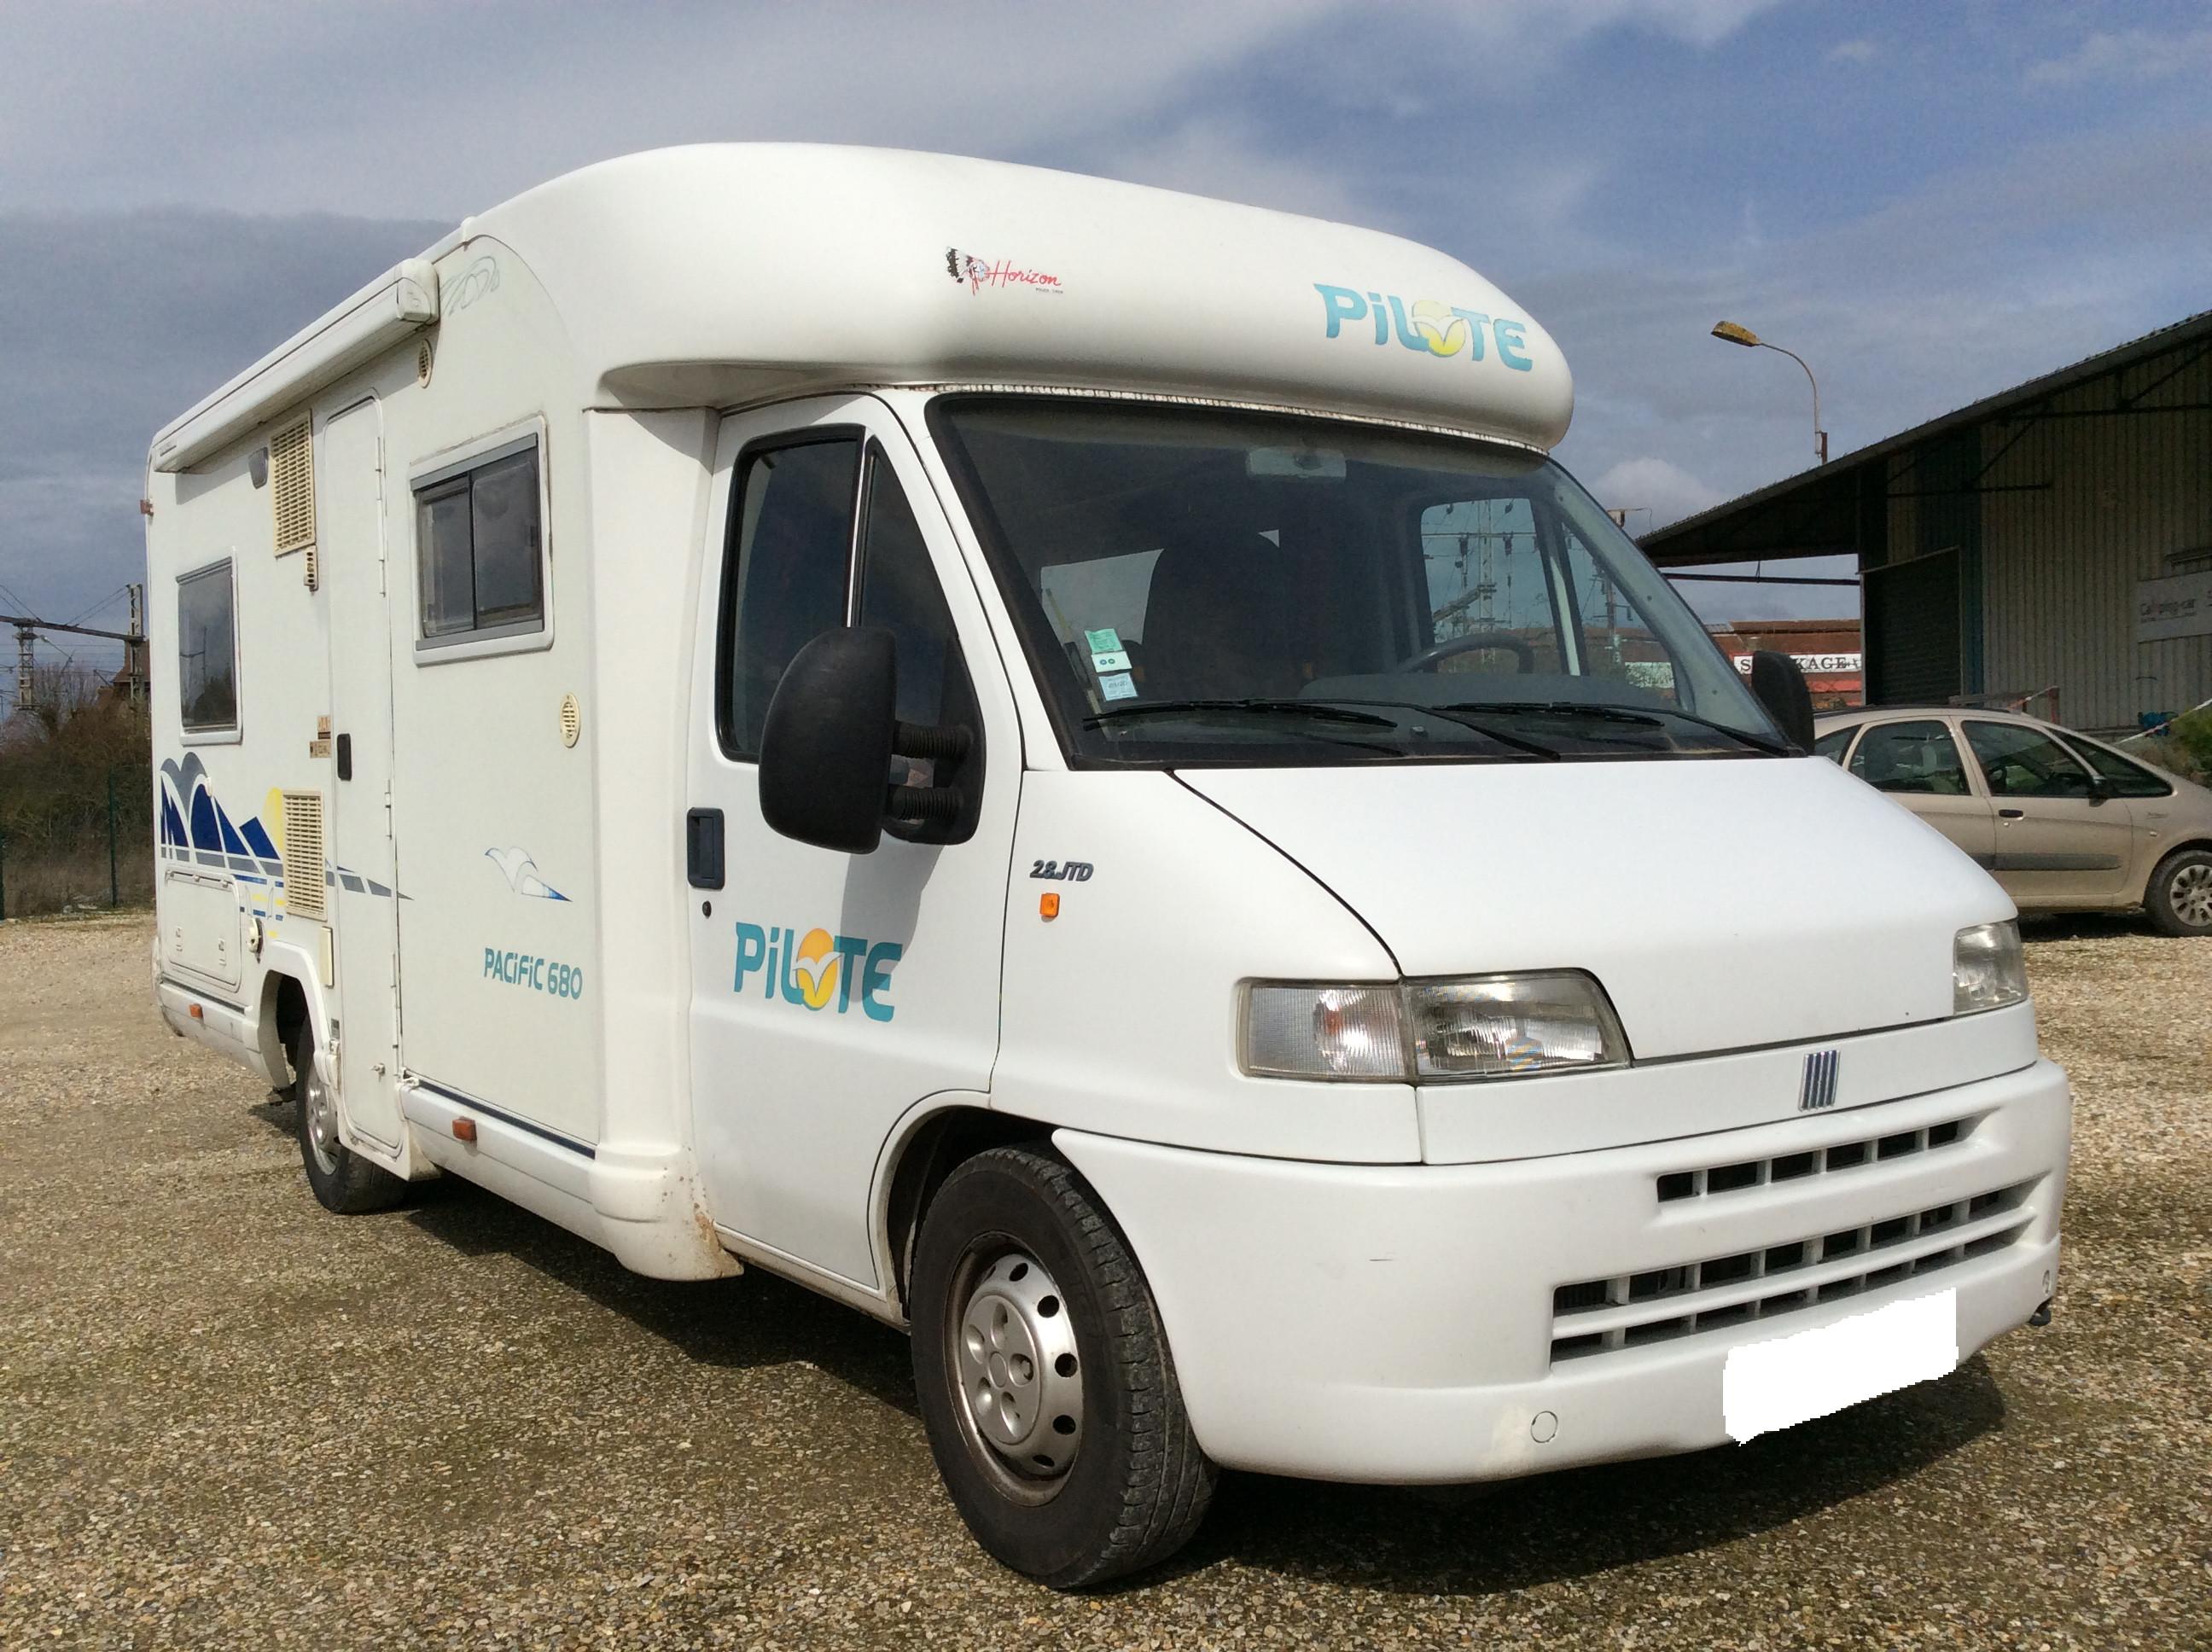 pilote pacific 680 occasion de 2001 fiat camping car en vente aubevoye eure 27. Black Bedroom Furniture Sets. Home Design Ideas